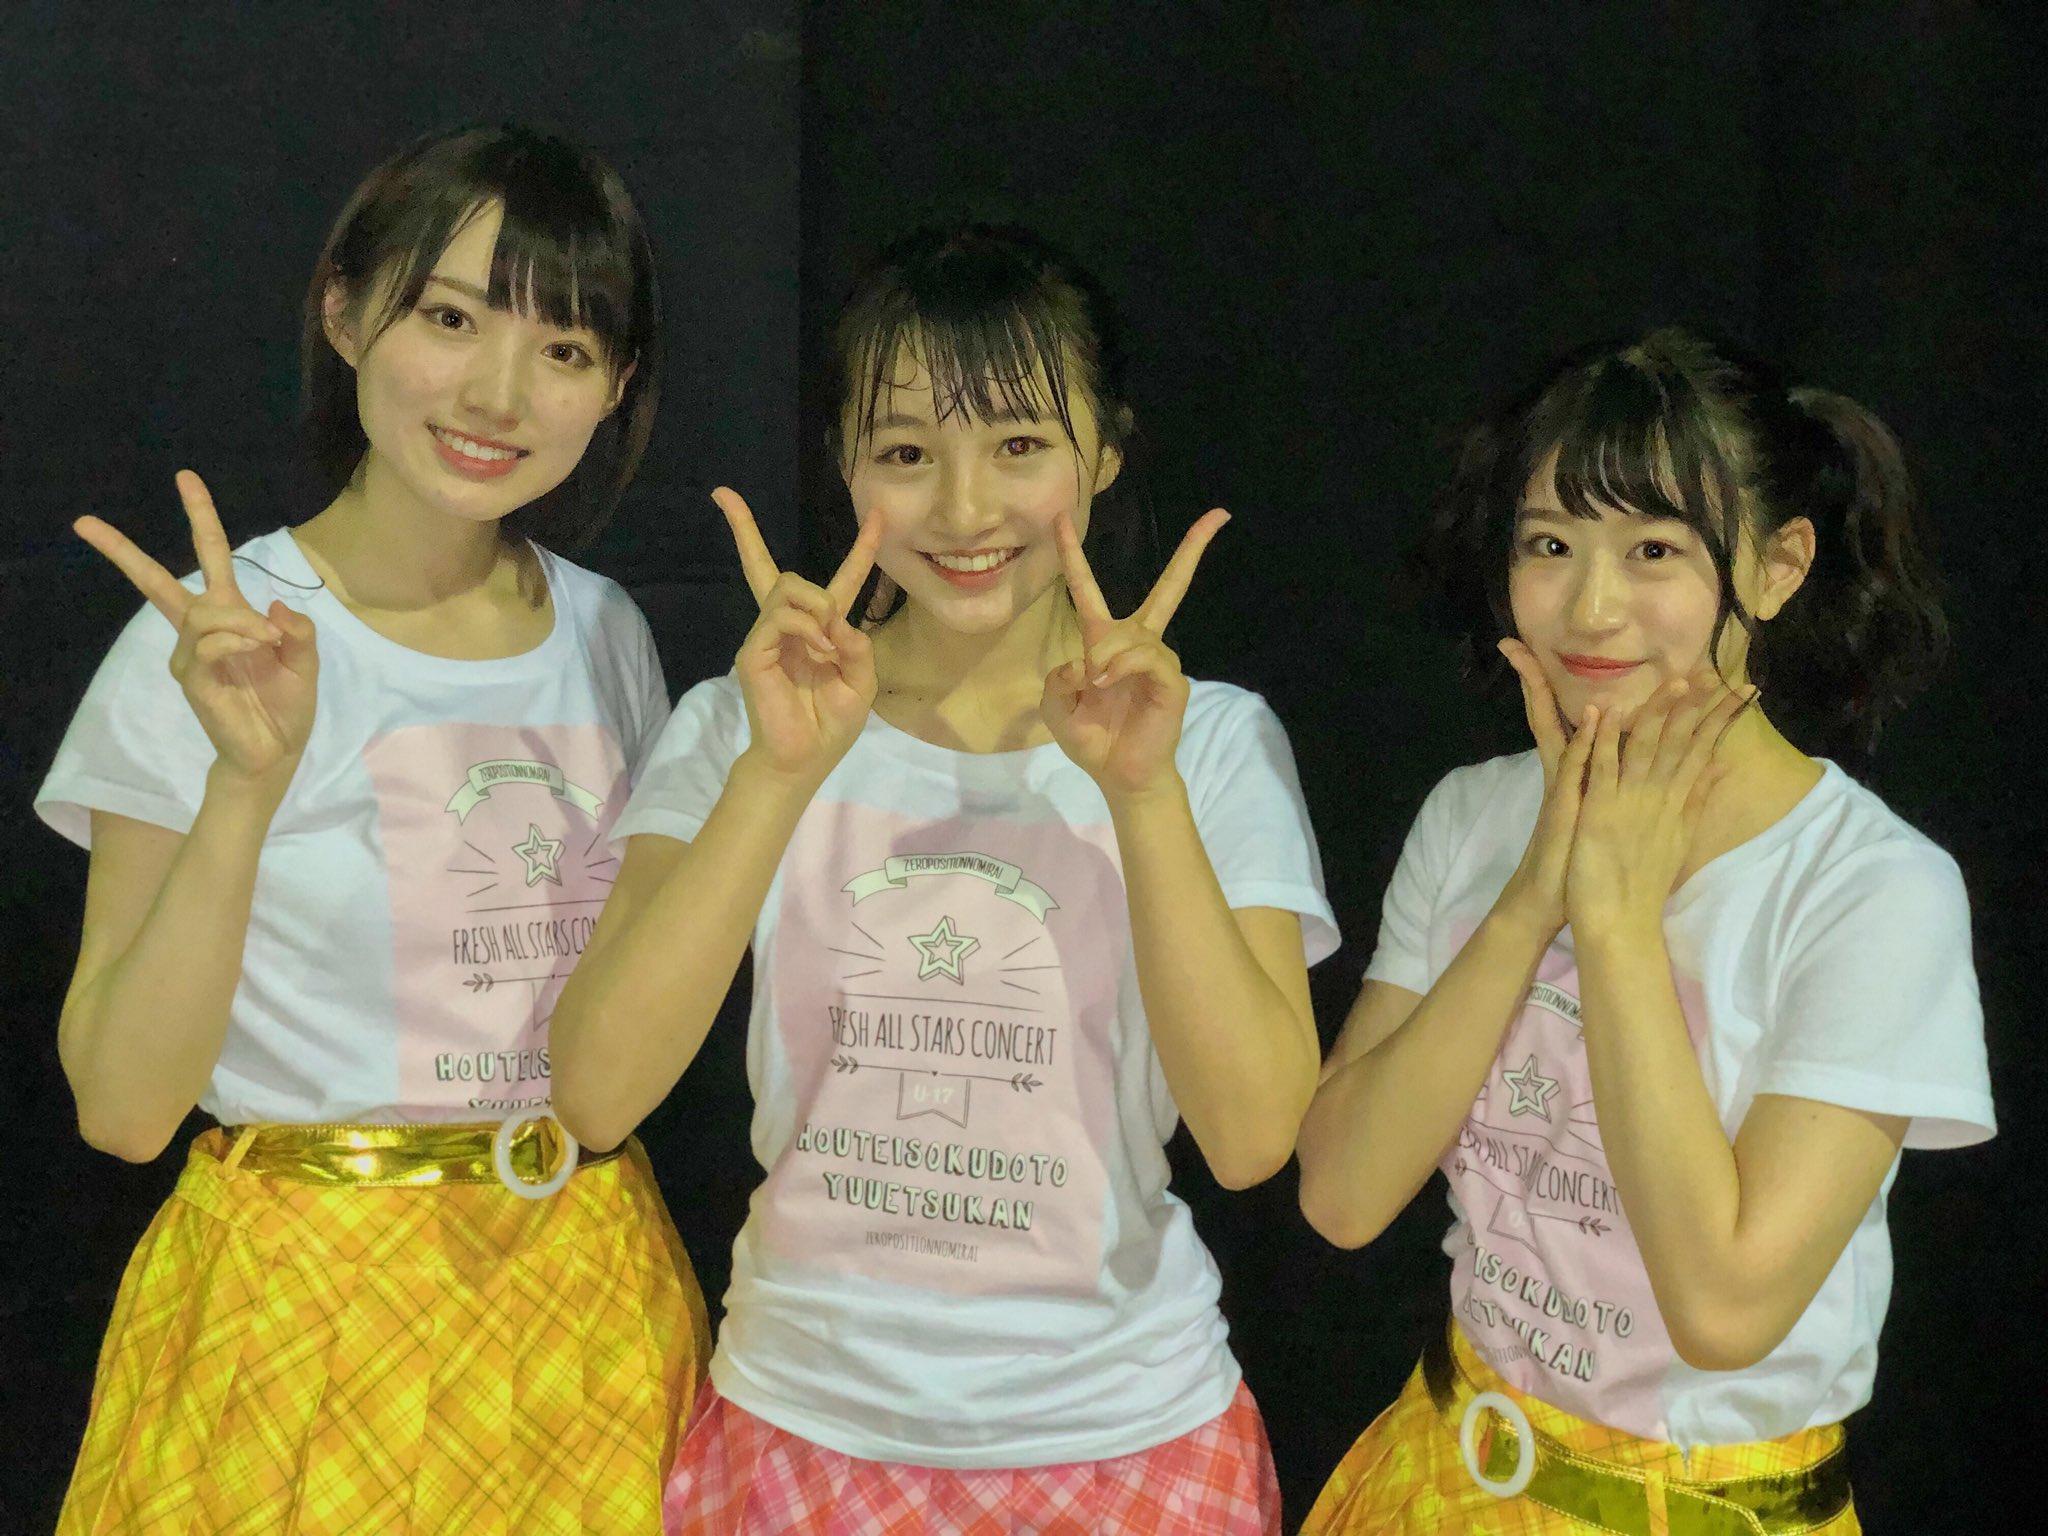 【NMB48】太田夢莉は今日も抜群に可愛い 他